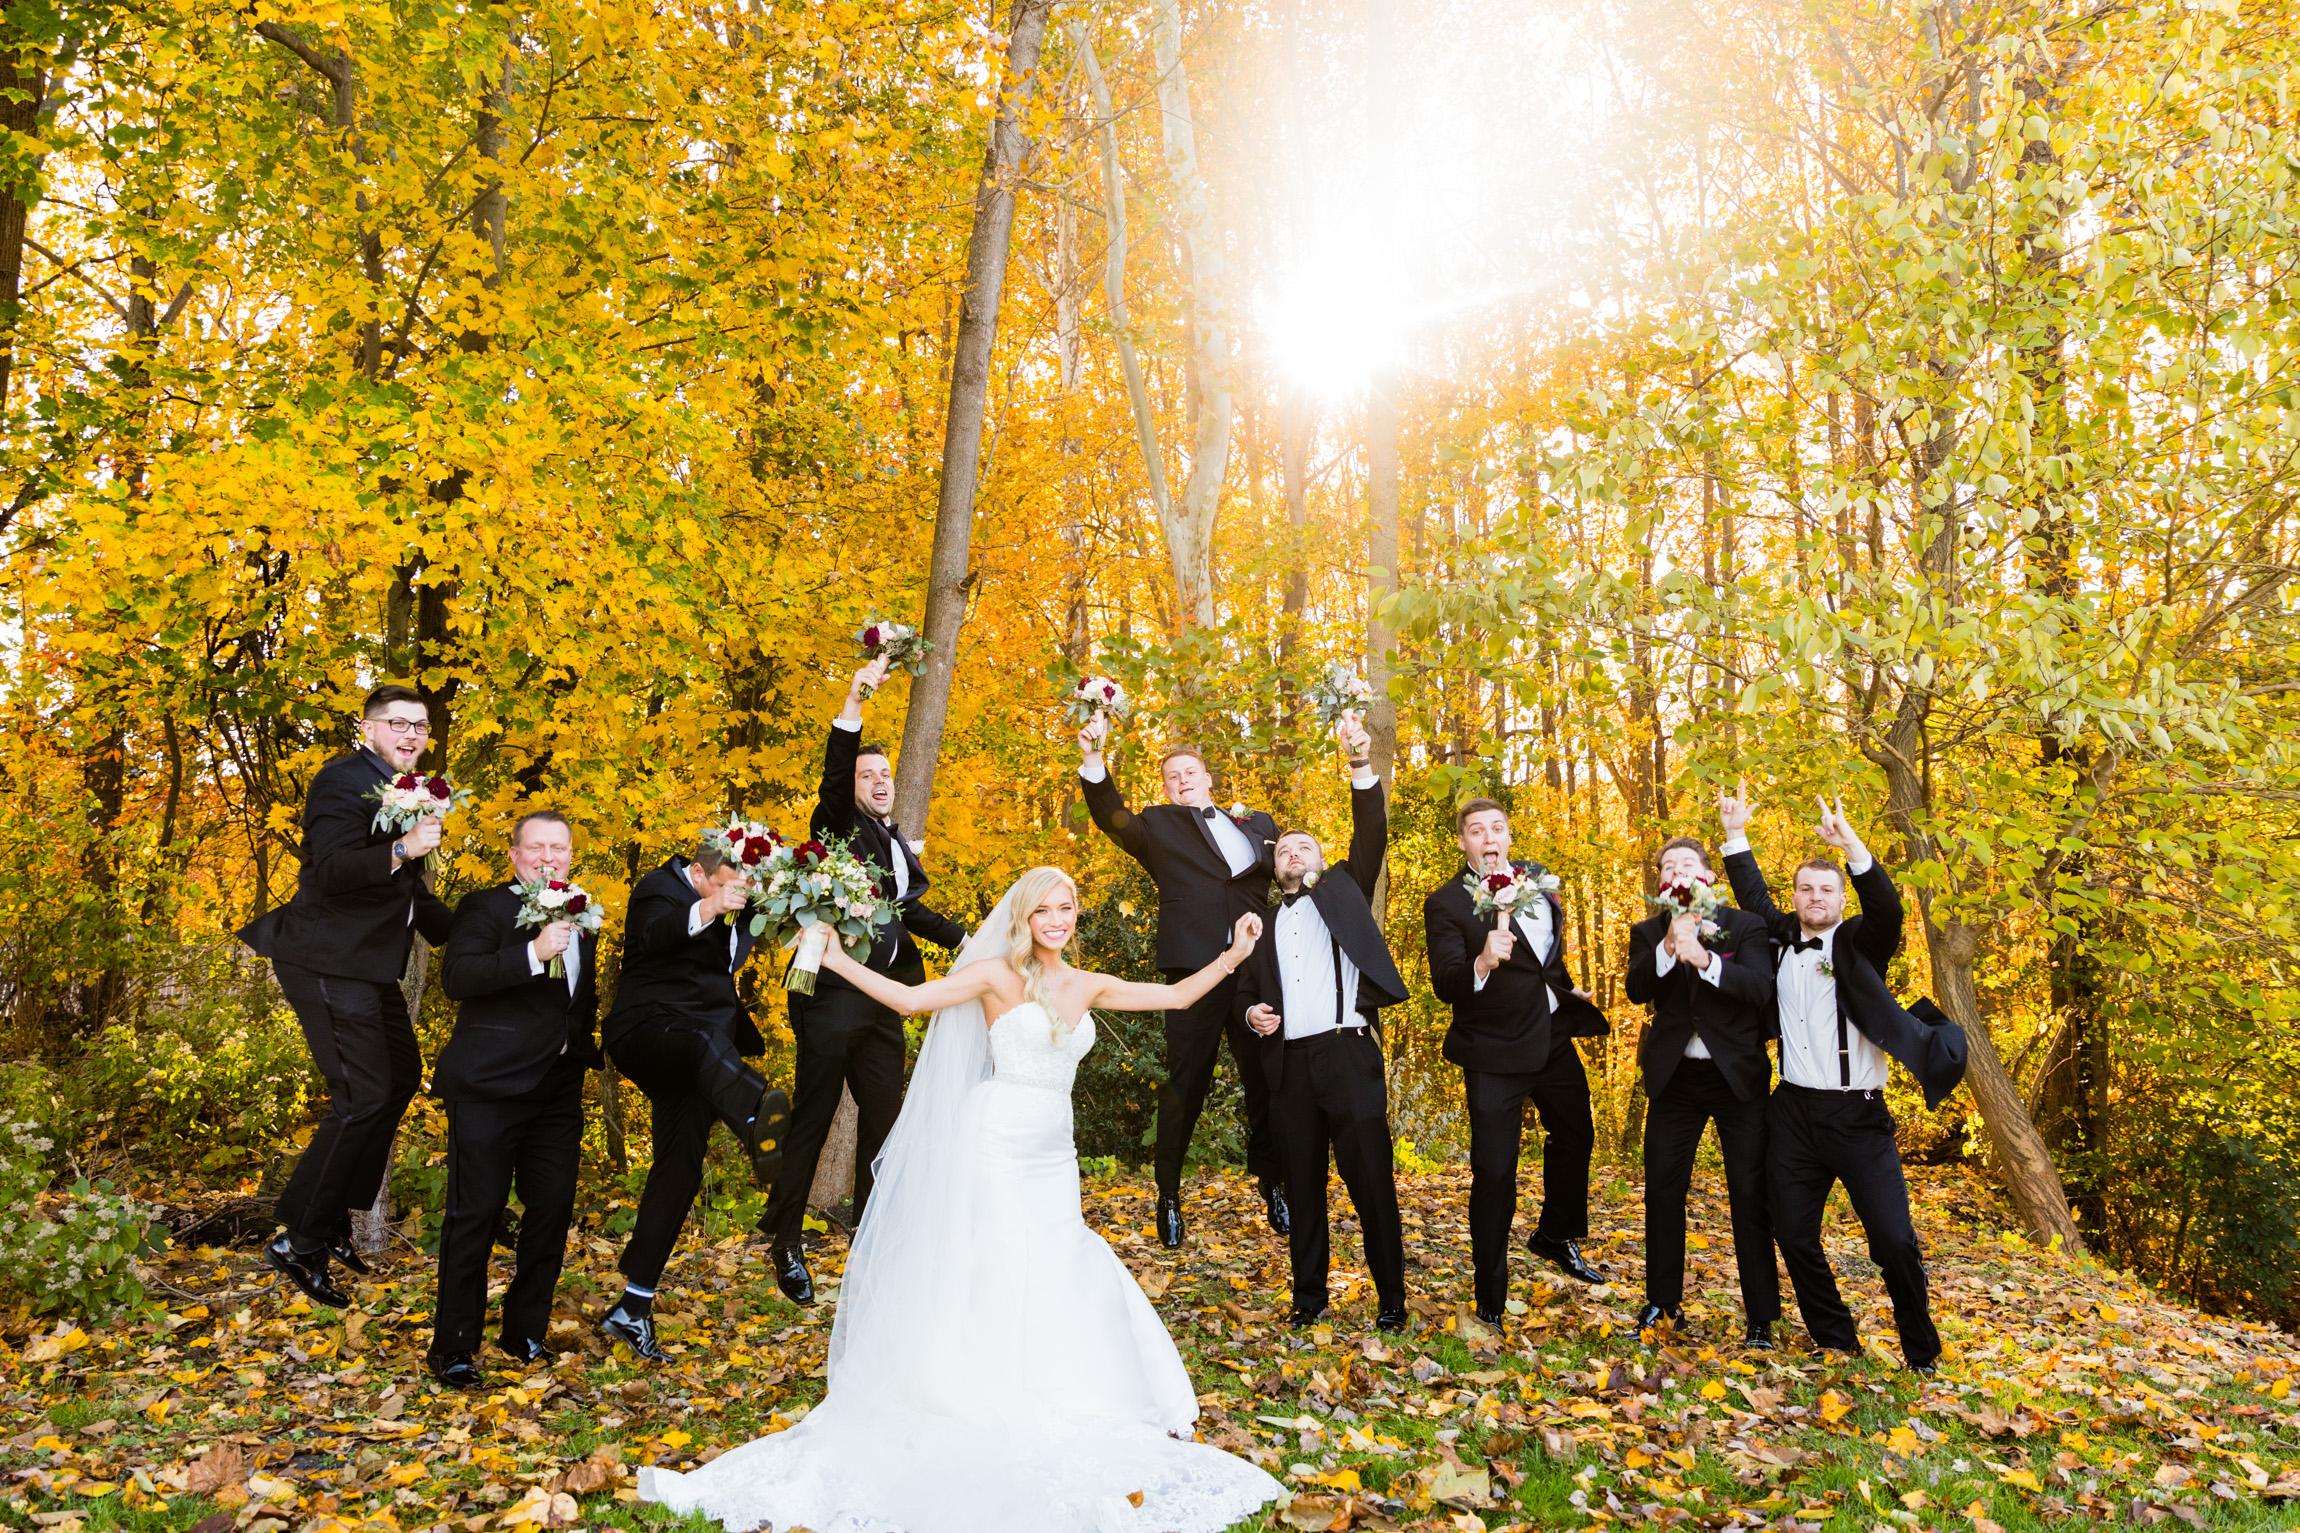 Luciens Manor - Wedding Photography -076.jpg